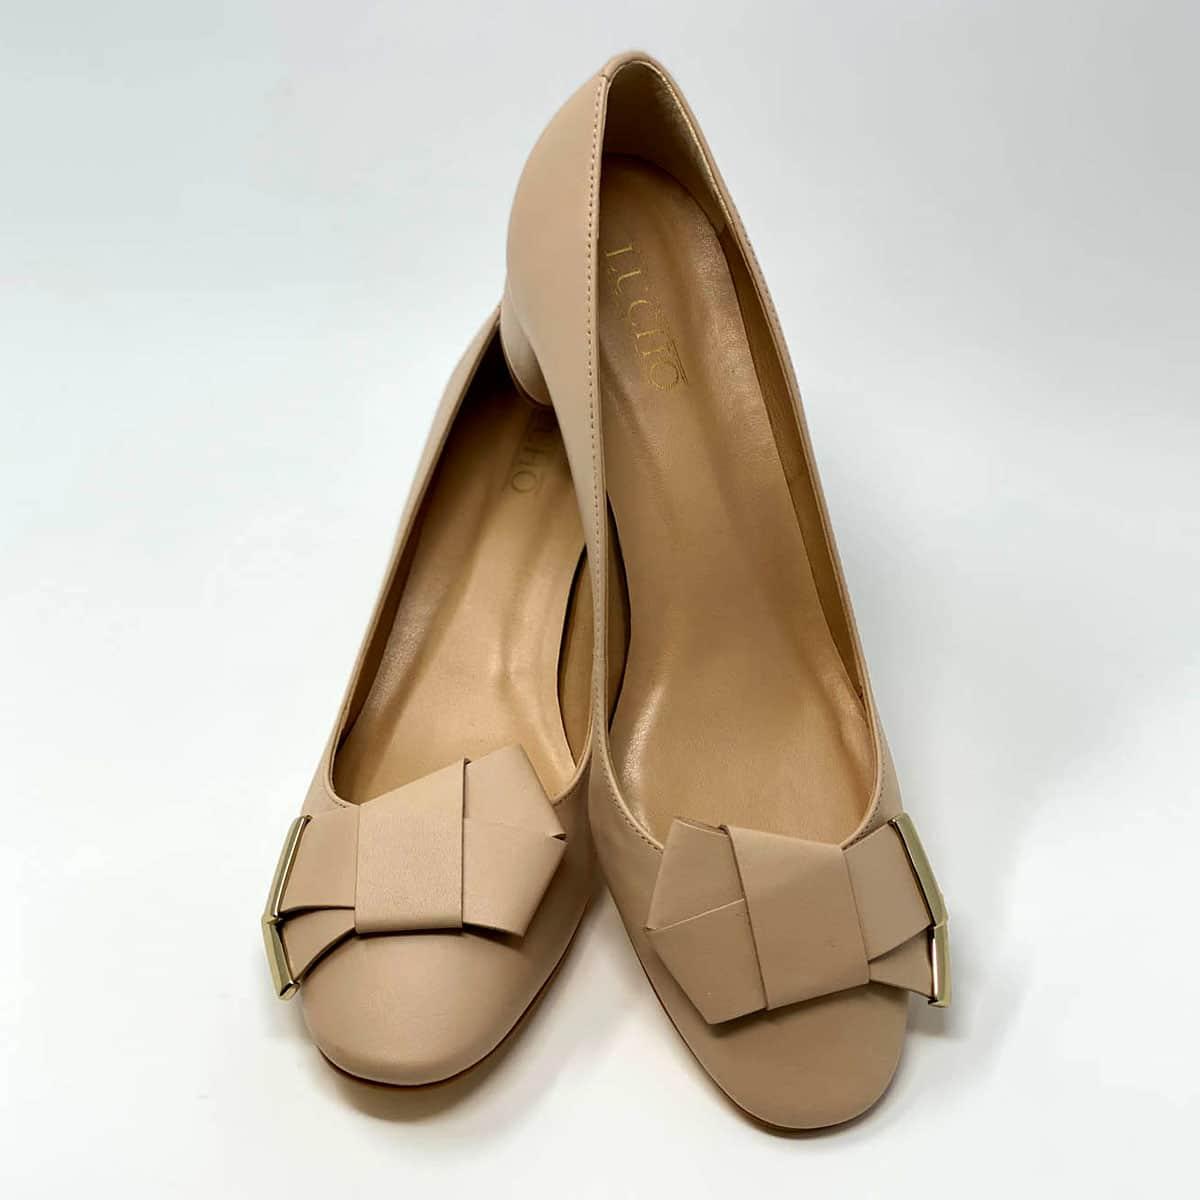 Nude Napa Round Heel